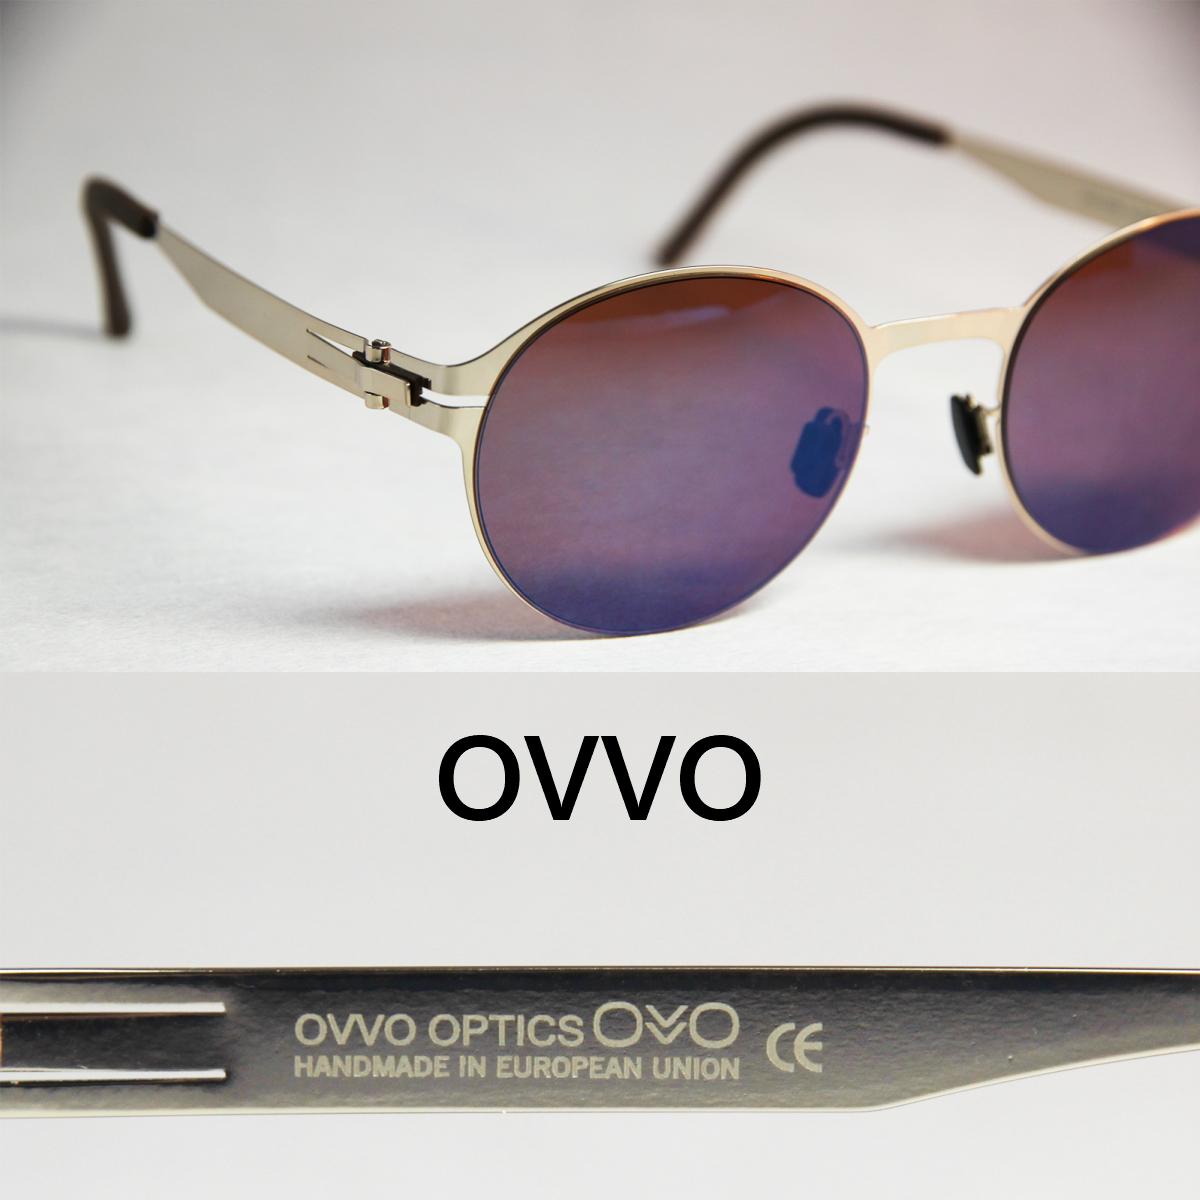 Ovvo mia gold/オッヴォ、ミアゴールド オーバル ボストン型 UVカット レディースサングラス 驚異の素材